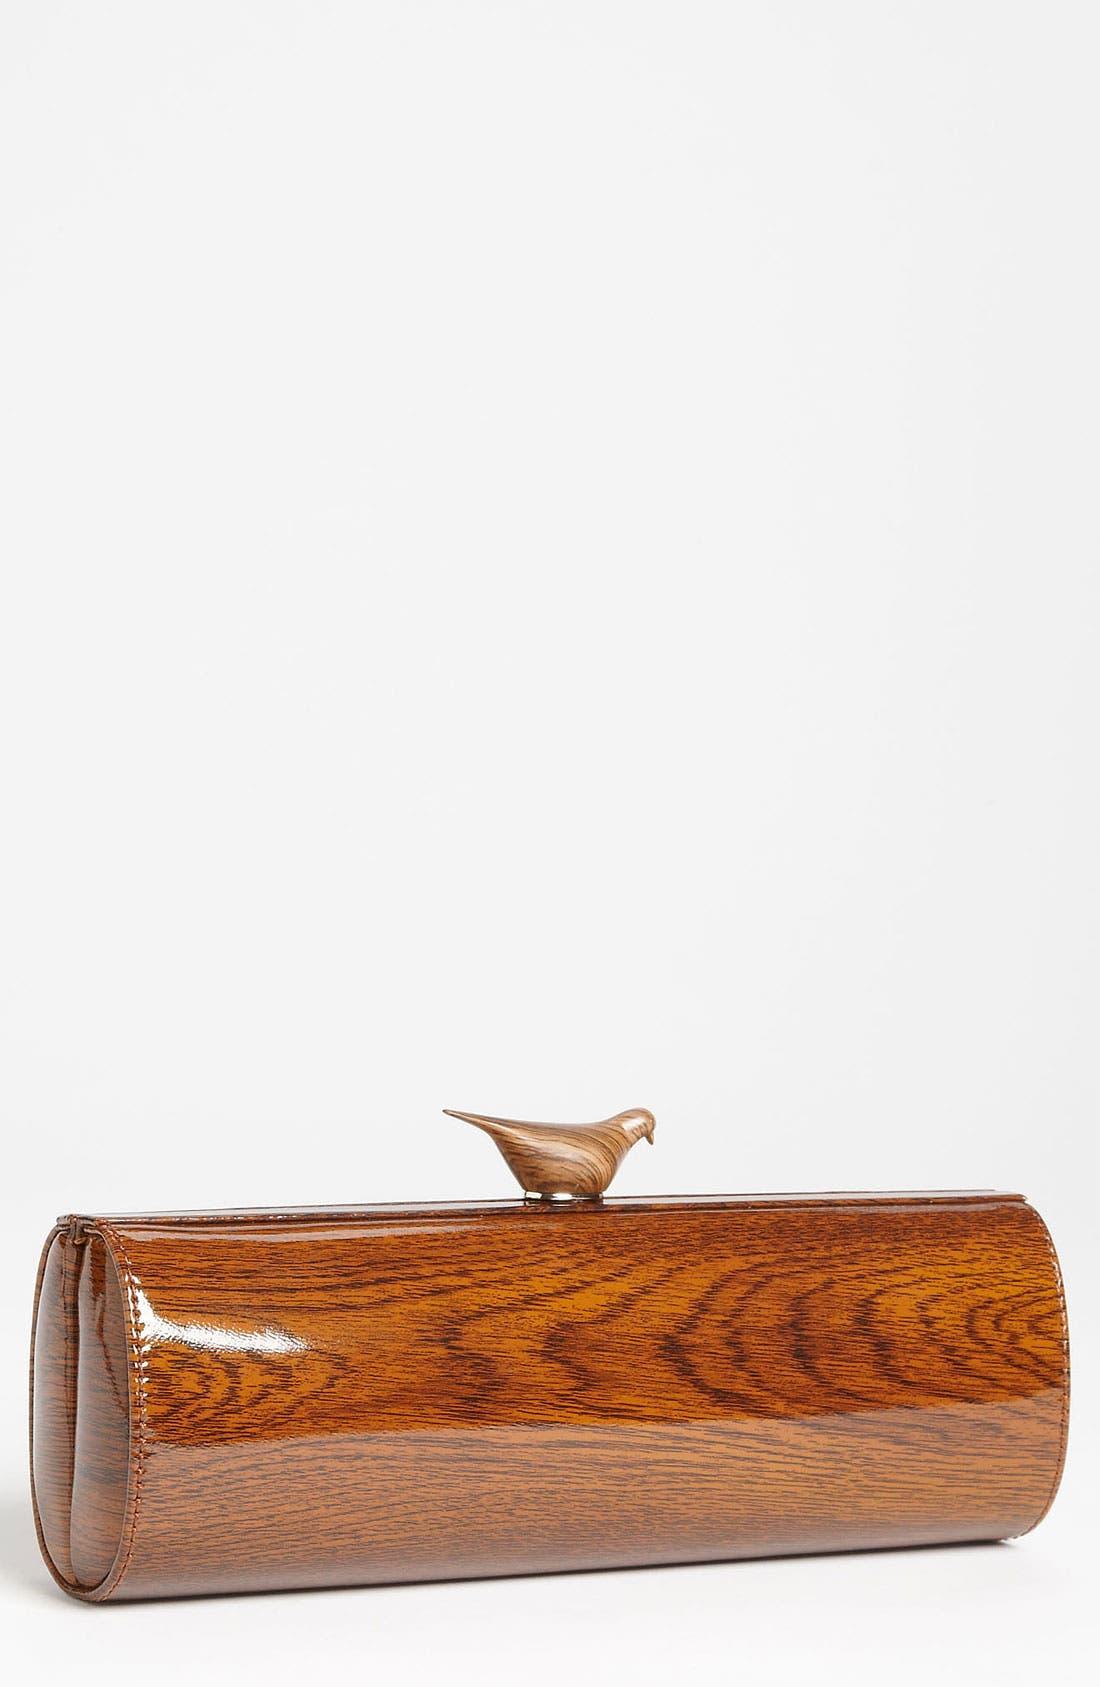 Main Image - kate spade new york 'knock on wood - woodpecker' clutch